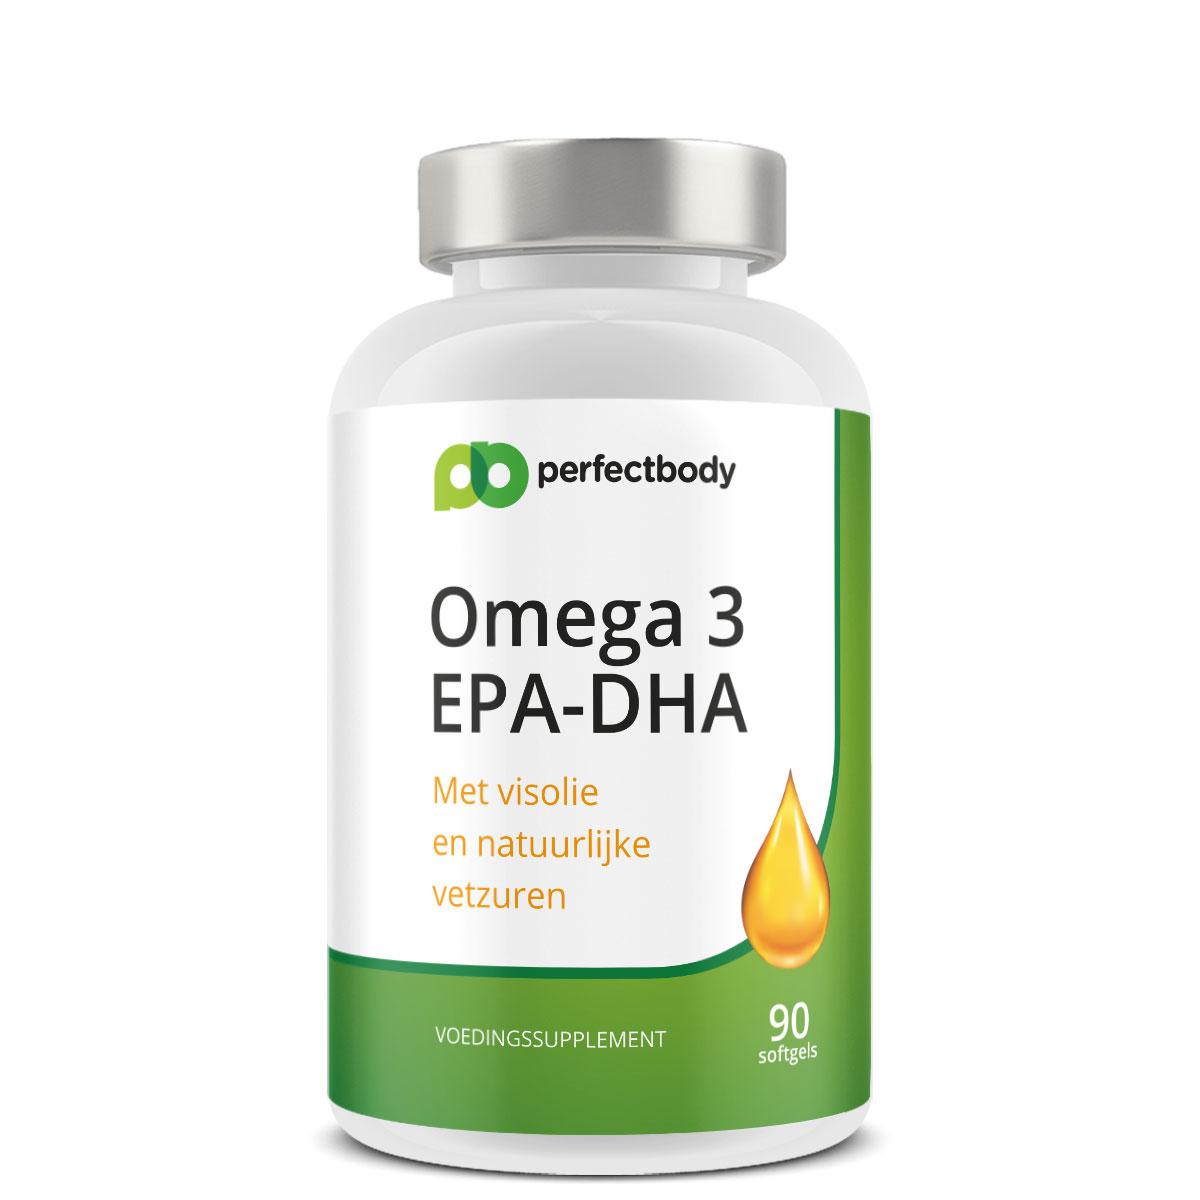 Perfectbody Omega 3 Visolie Capsules (DHA/EPA) - 90 Softgels